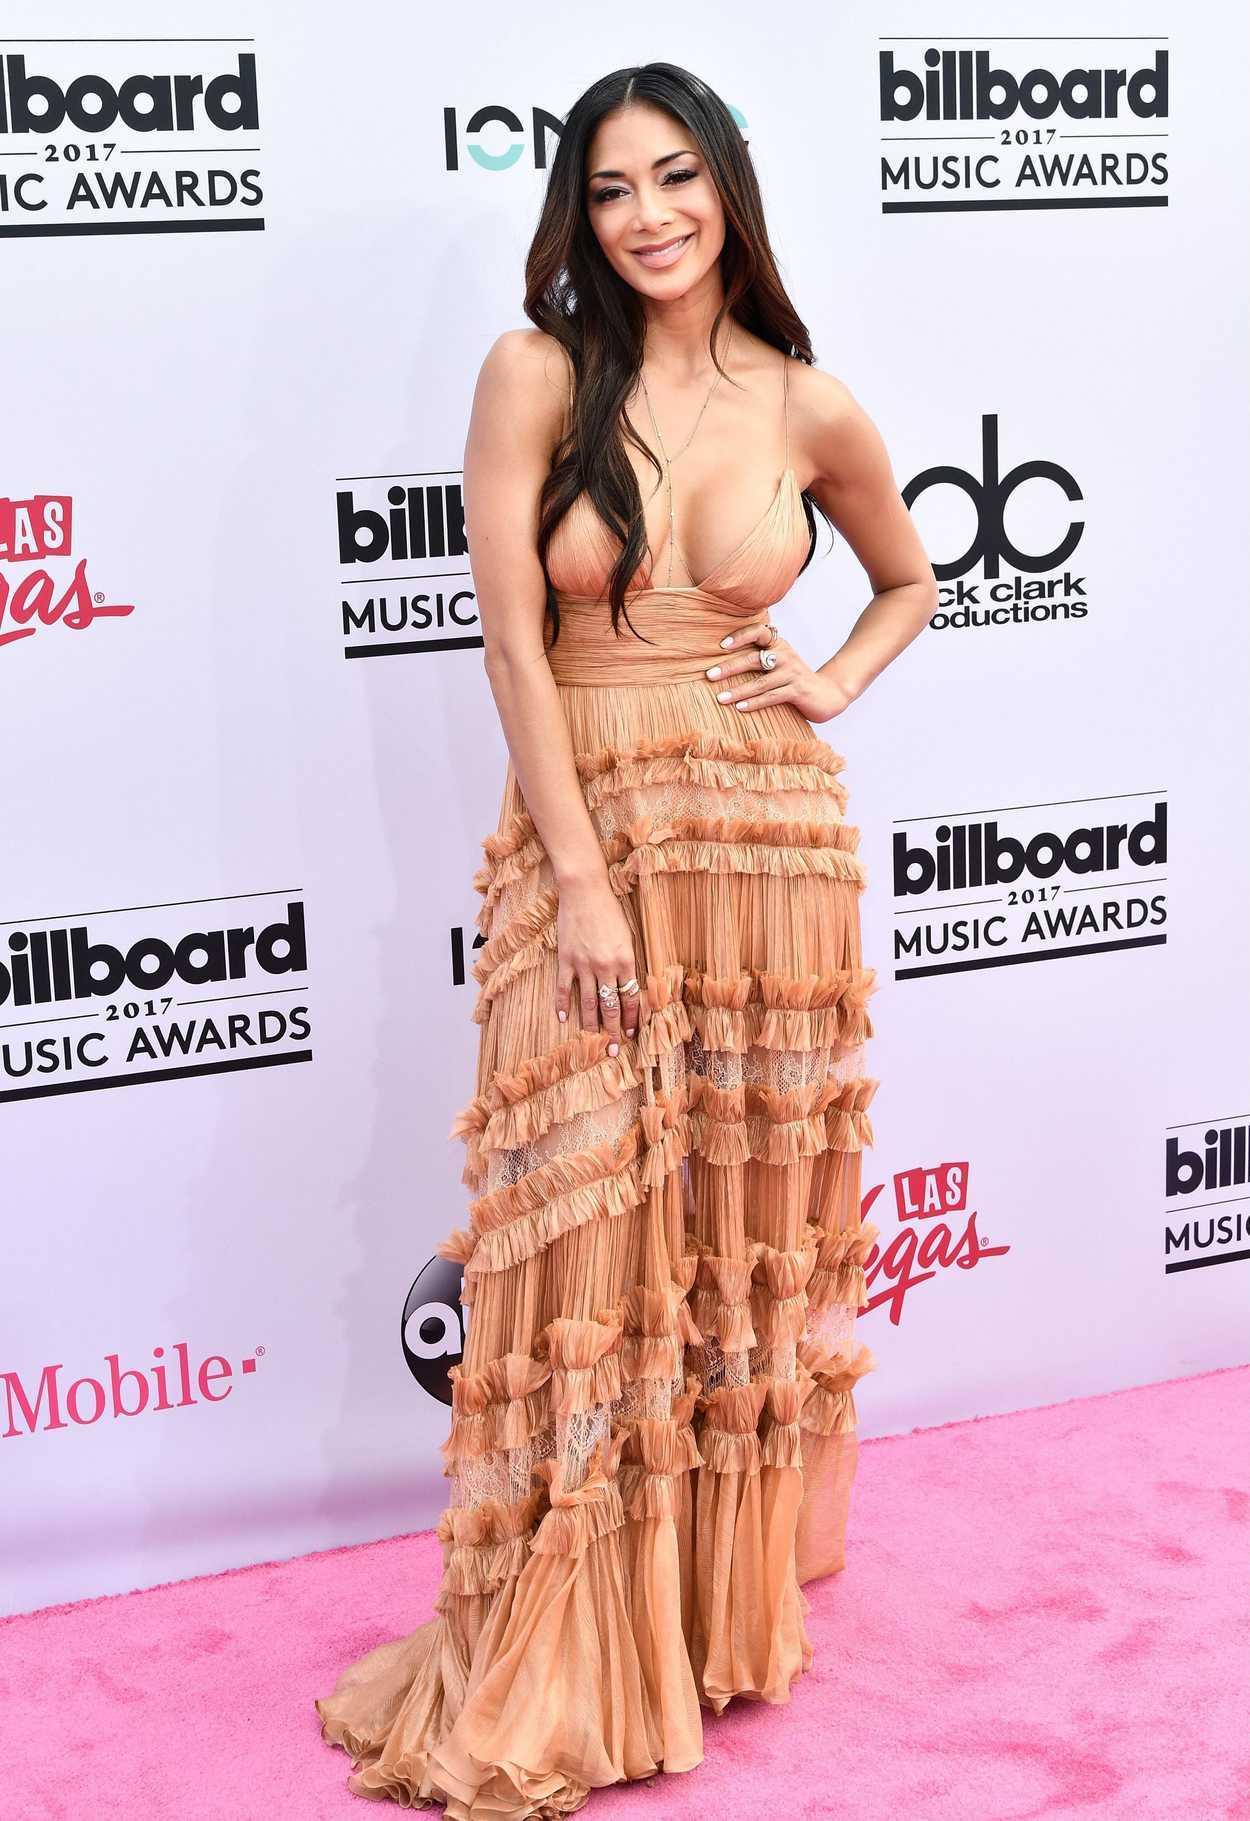 Nicole Scherzinger at the 2017 Billboard Music Awards in Las Vegas 05/21/2017 – celebsla.com